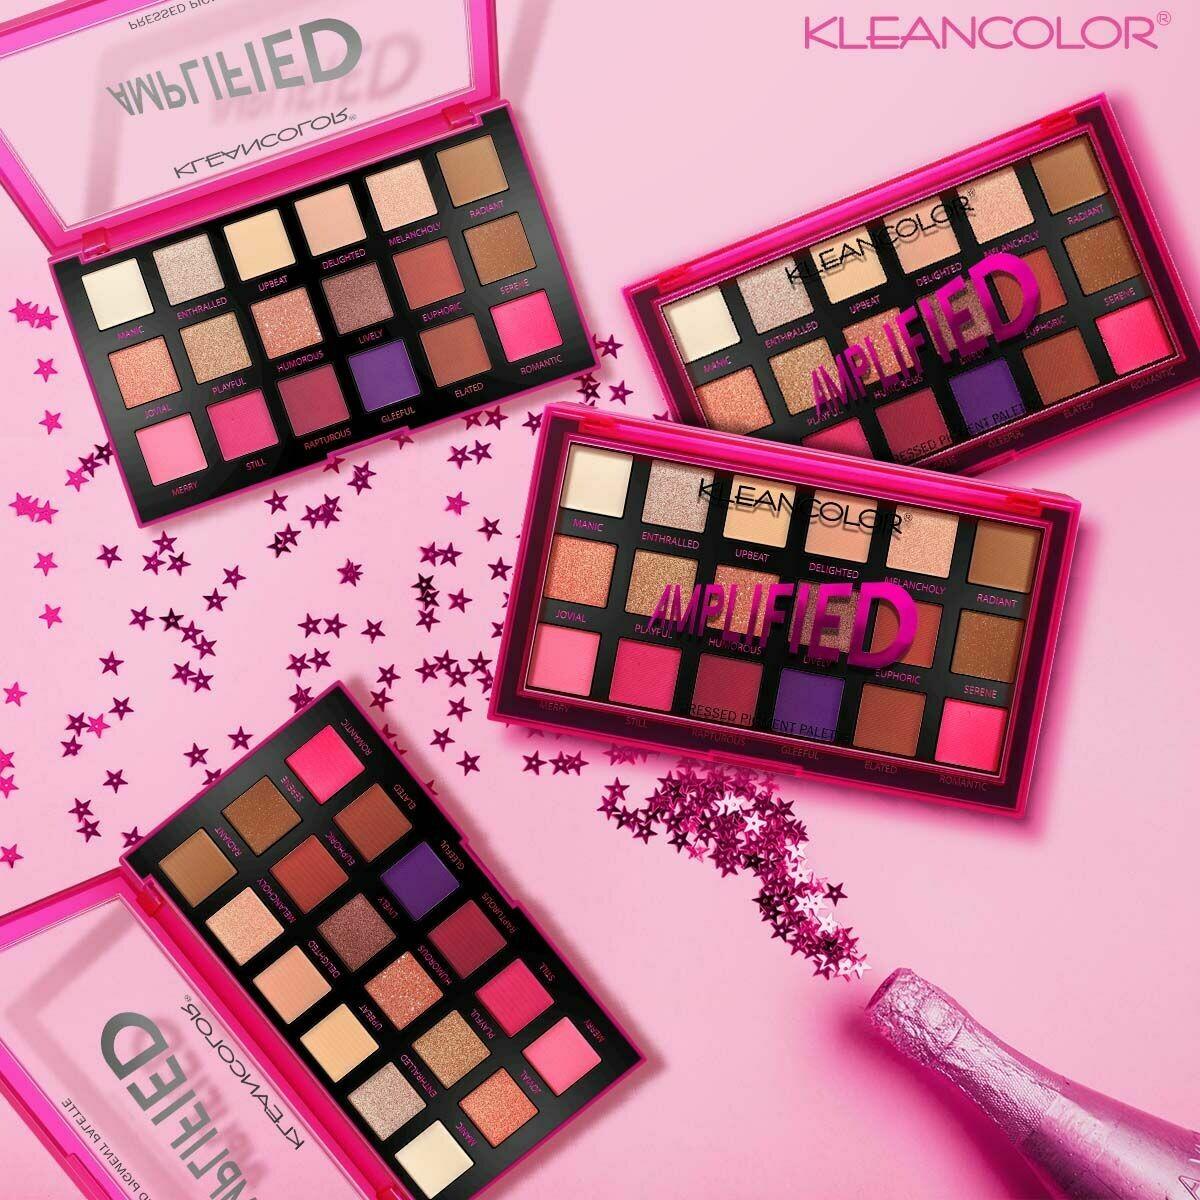 Amplified Pressed Pigment Palette - KLEANCOLOR